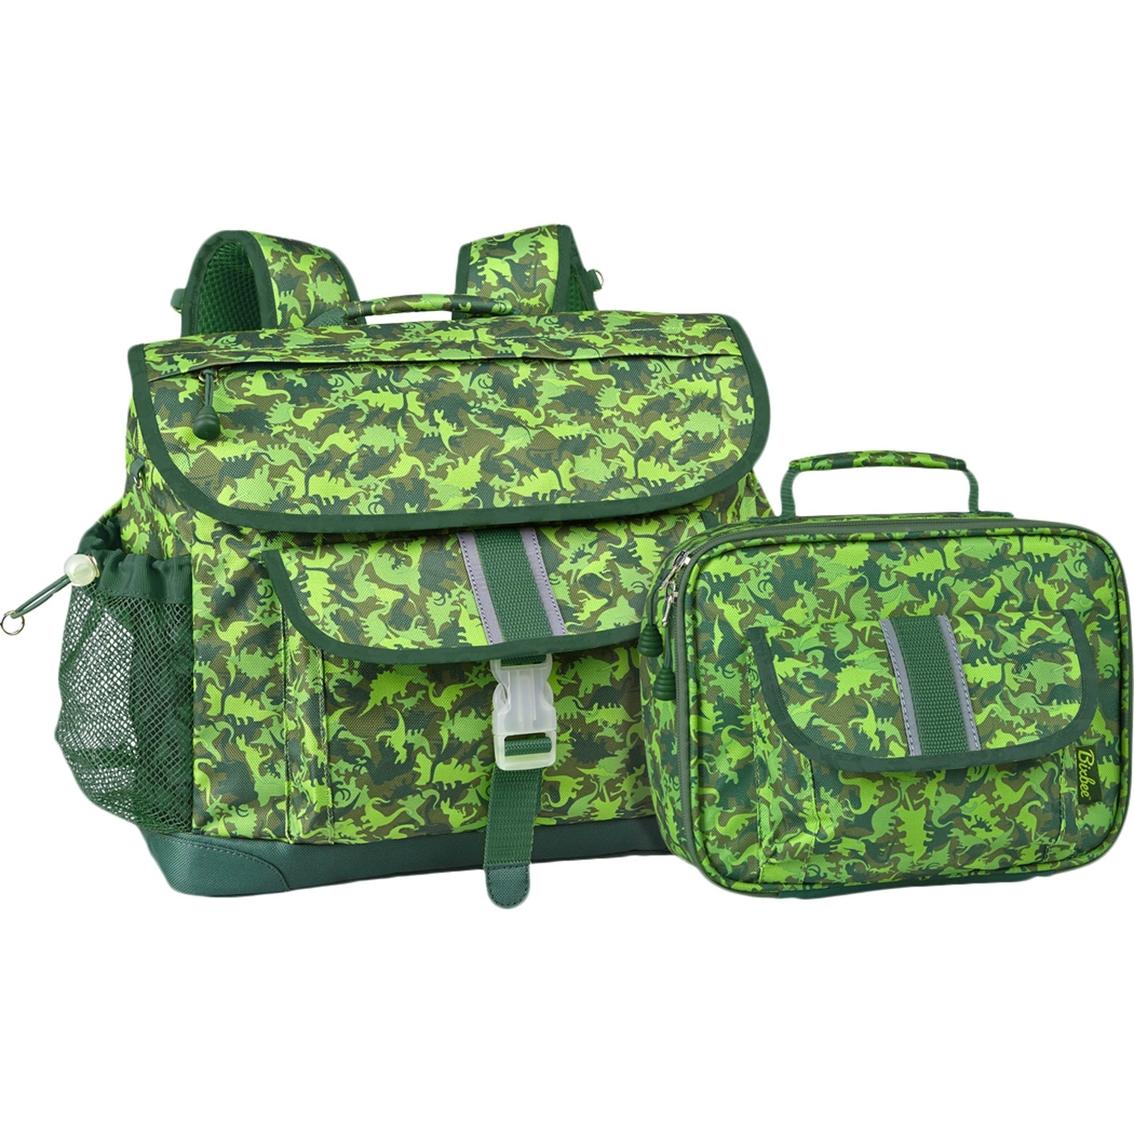 2ae954a4e16b Bixbee Dino Camo Backpack And Lunch Kit Set | Backpacks | More ...